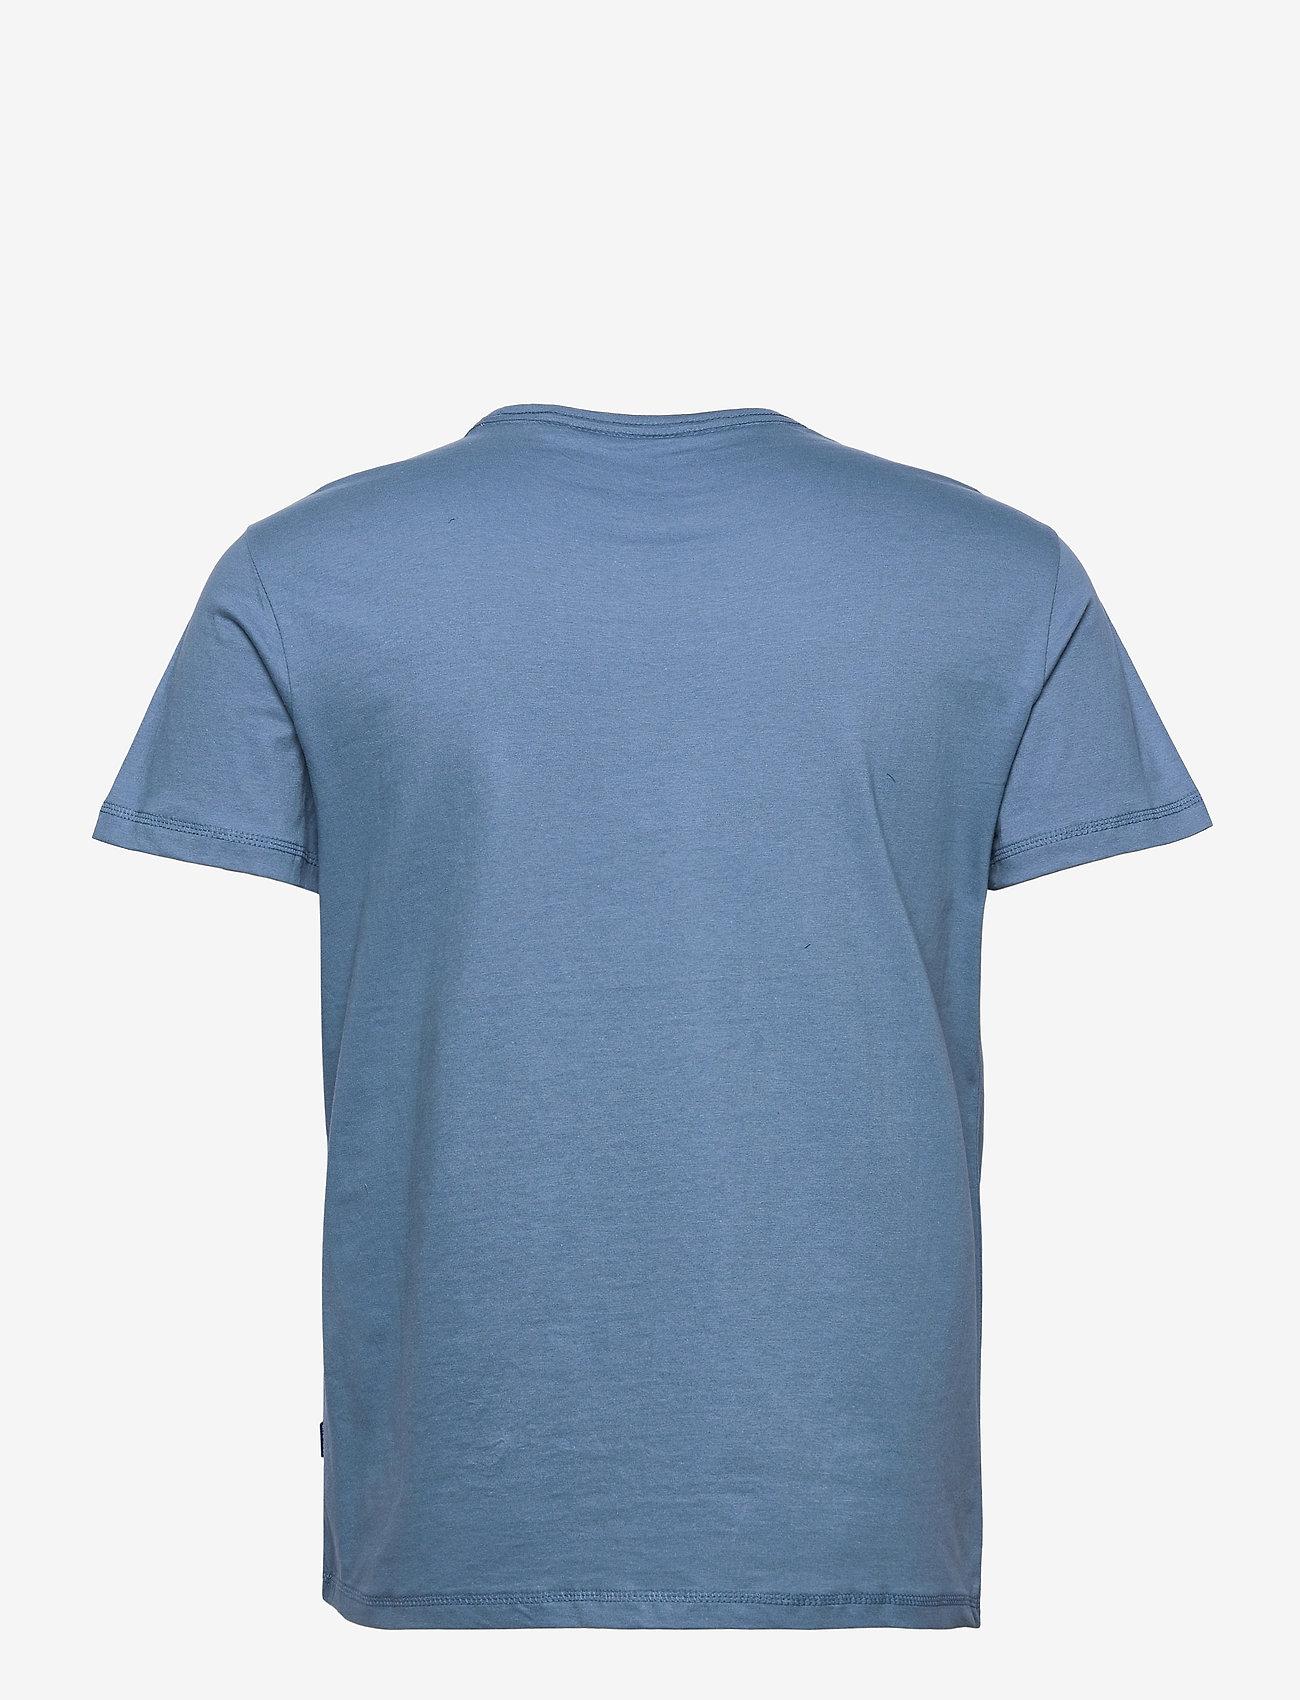 Blend - Tee - korte mouwen - moonlight blue - 1